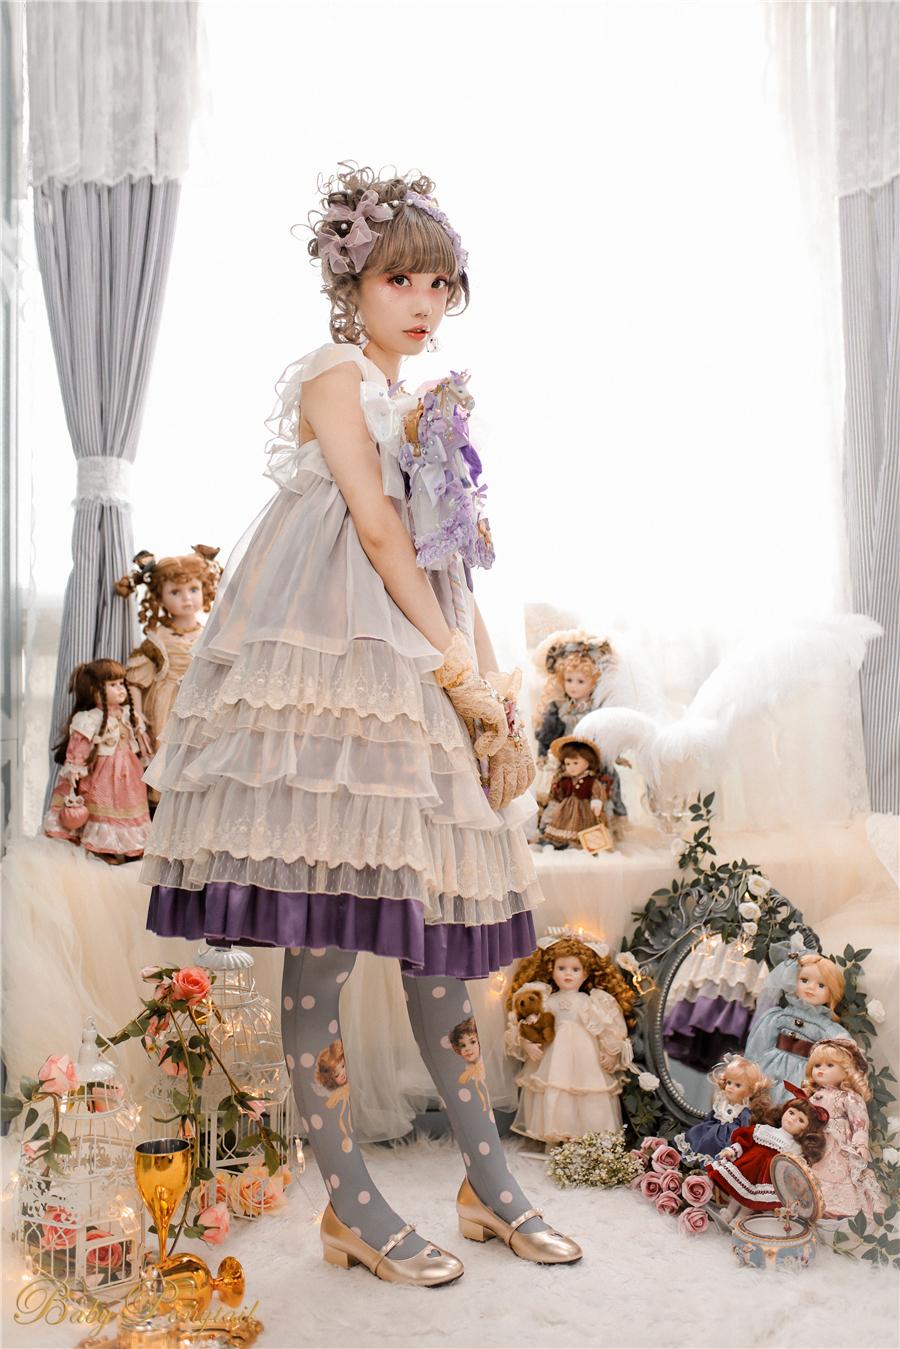 Babyponytail_Model Photo_Present Angel_JSK Violet_2_Kaka_04.jpg